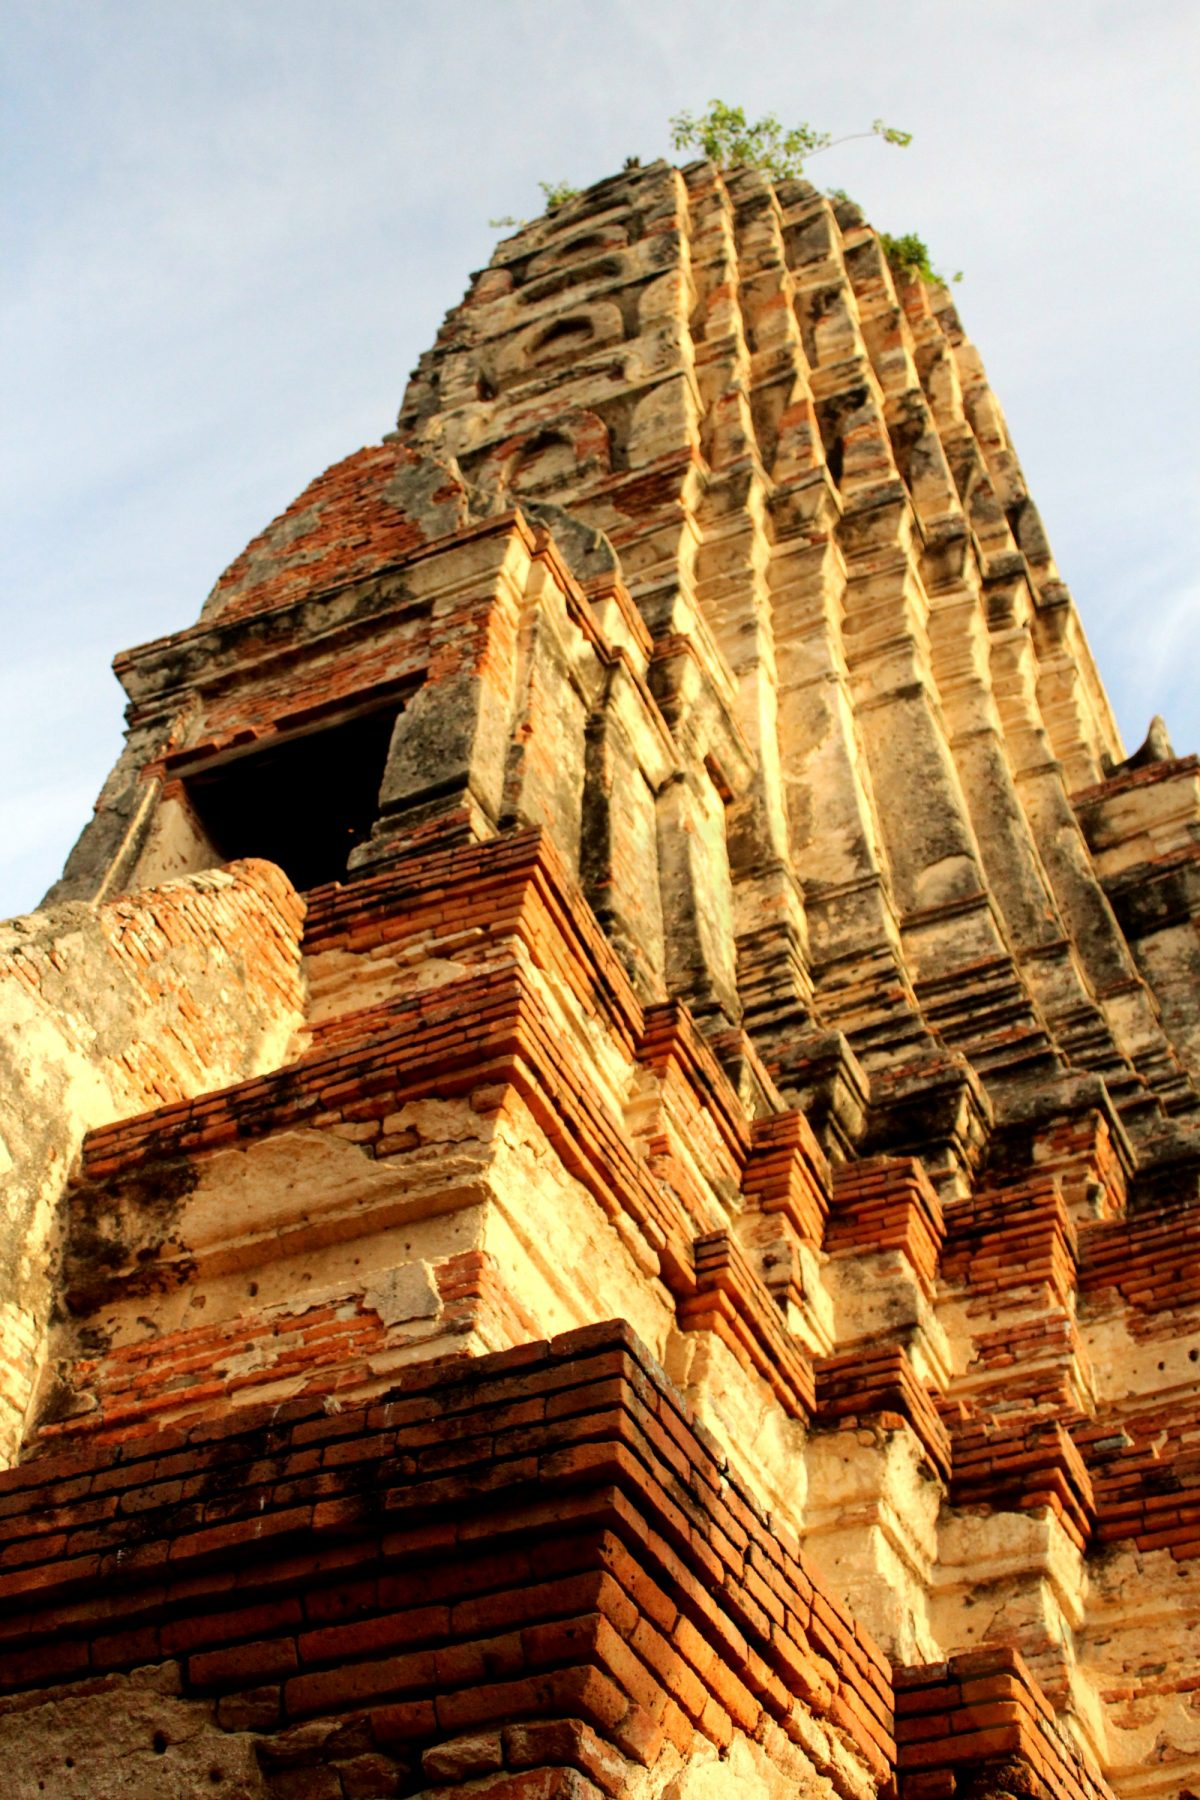 Breathtaking beauty of Wat Chai Watthanaram